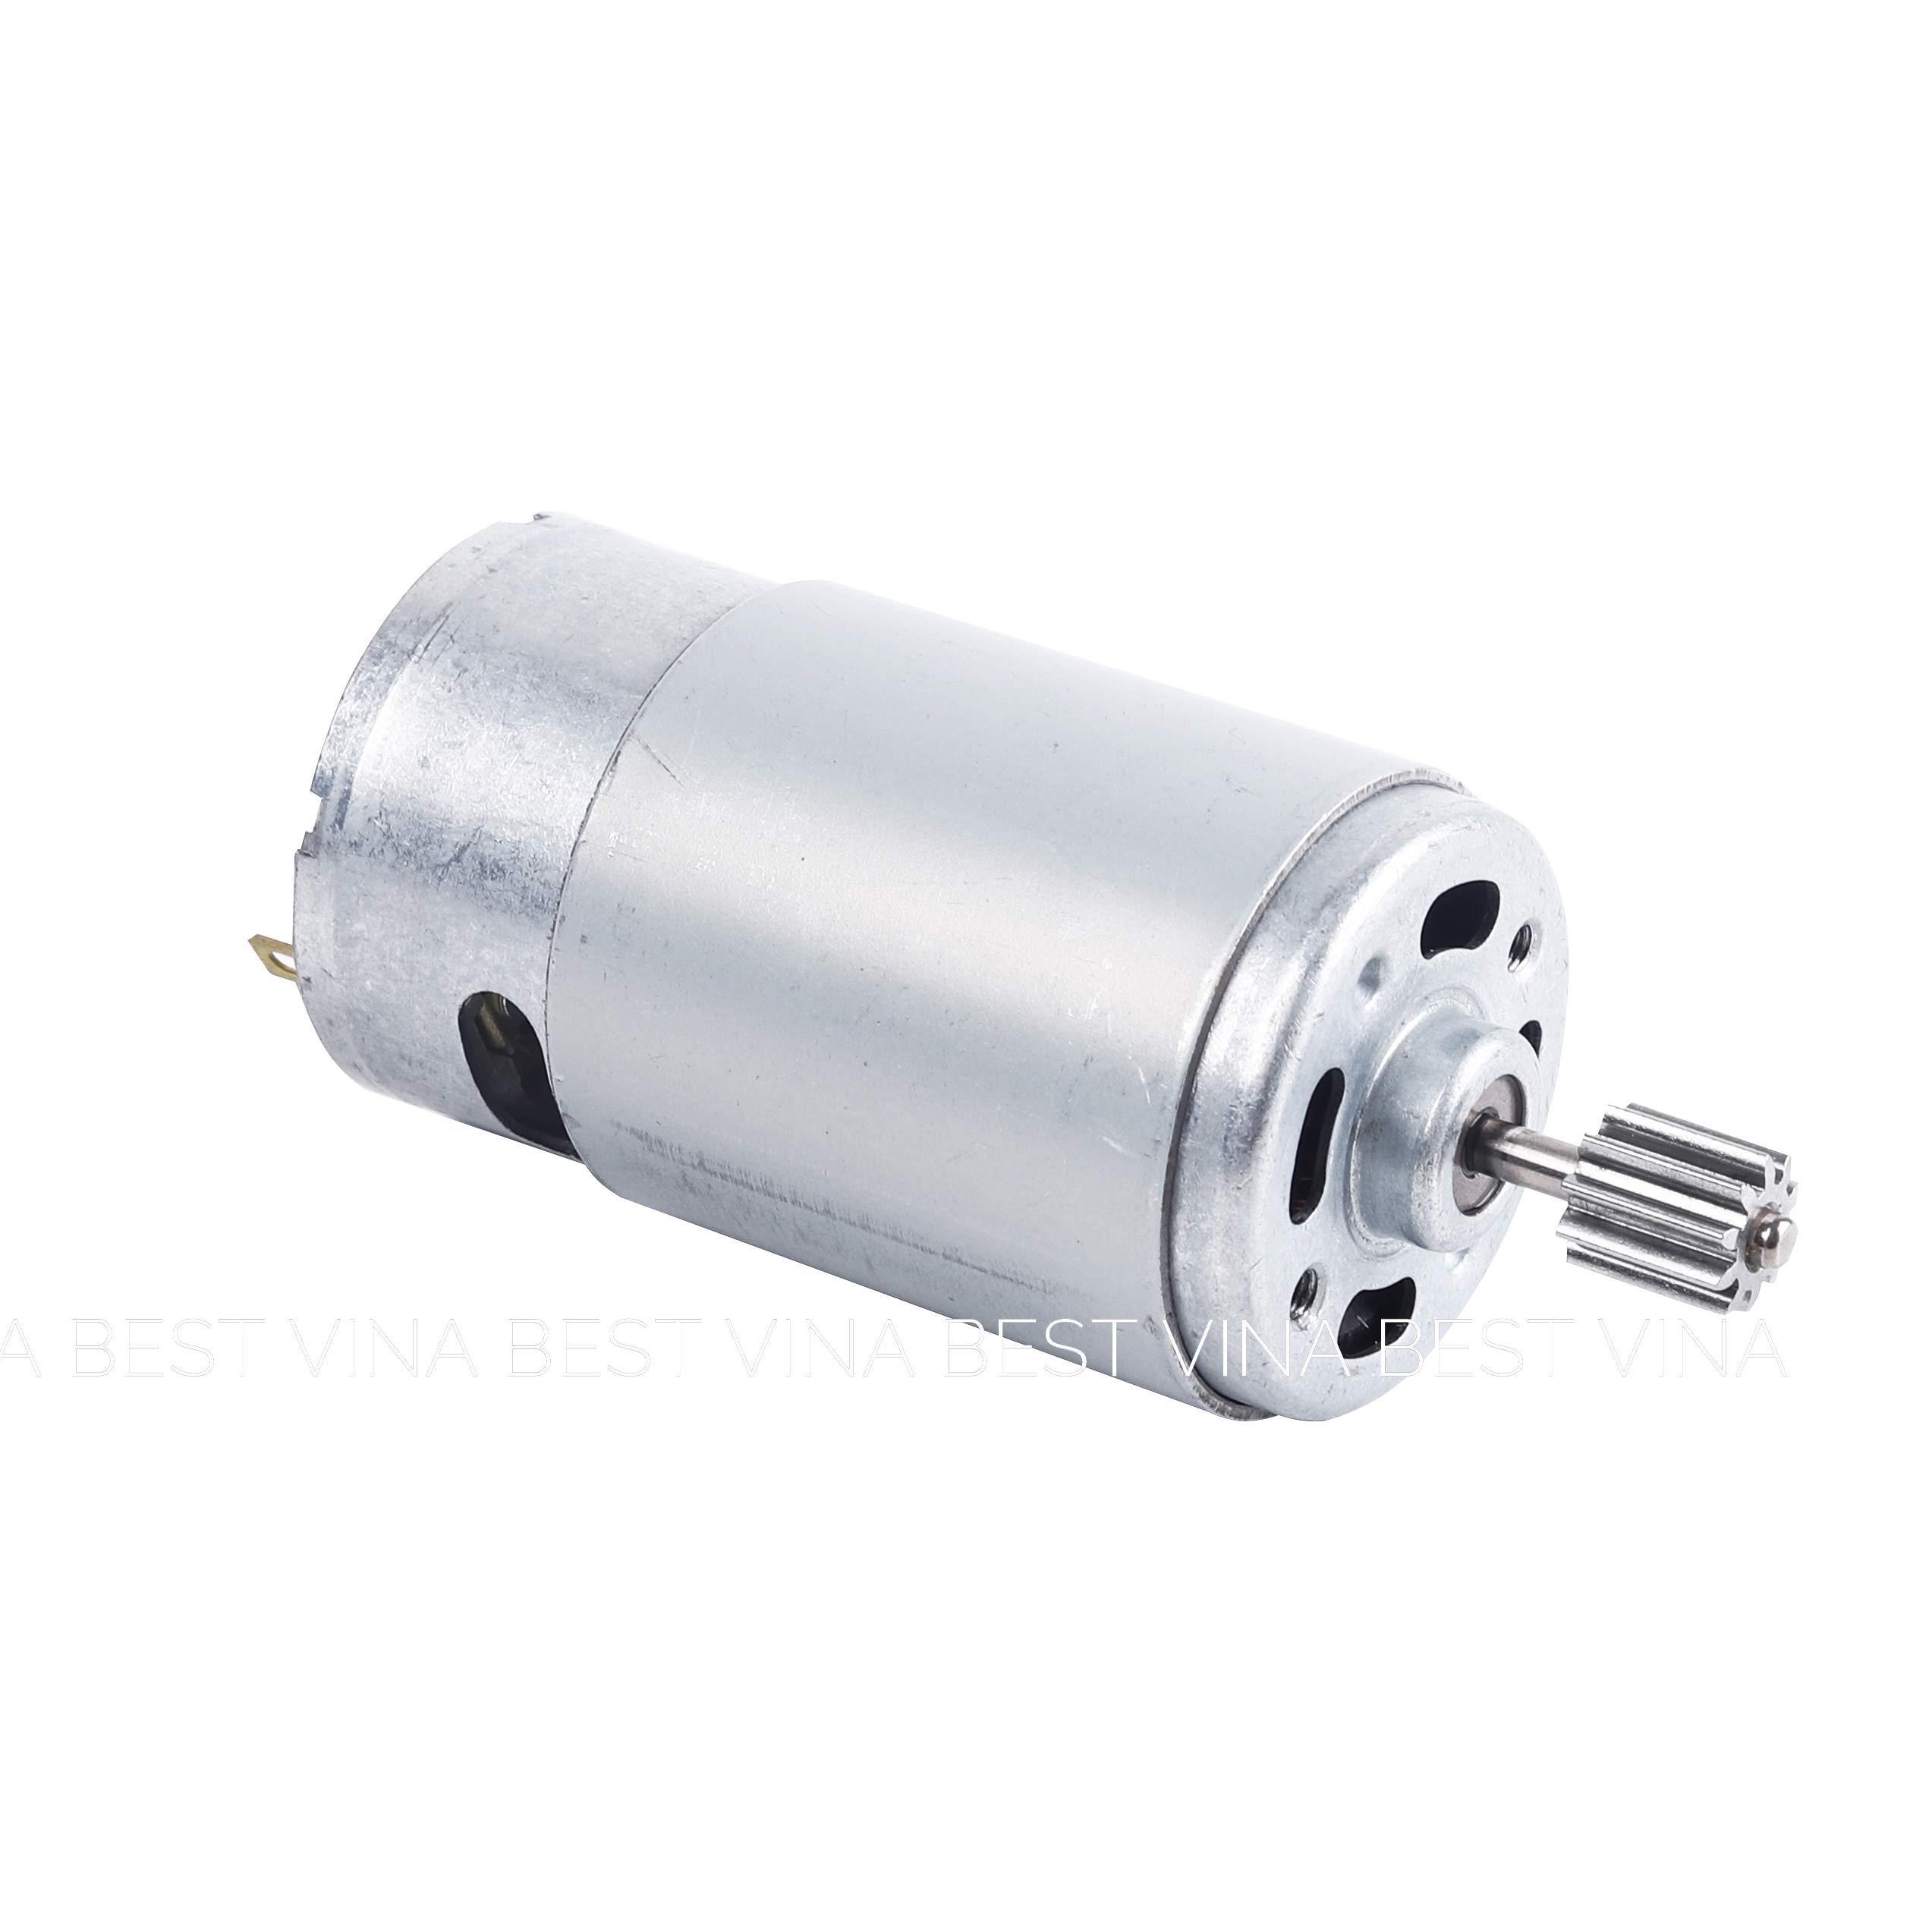 NSD 570 35000RPM Electric Motor RS570 12V High Speed Motor D